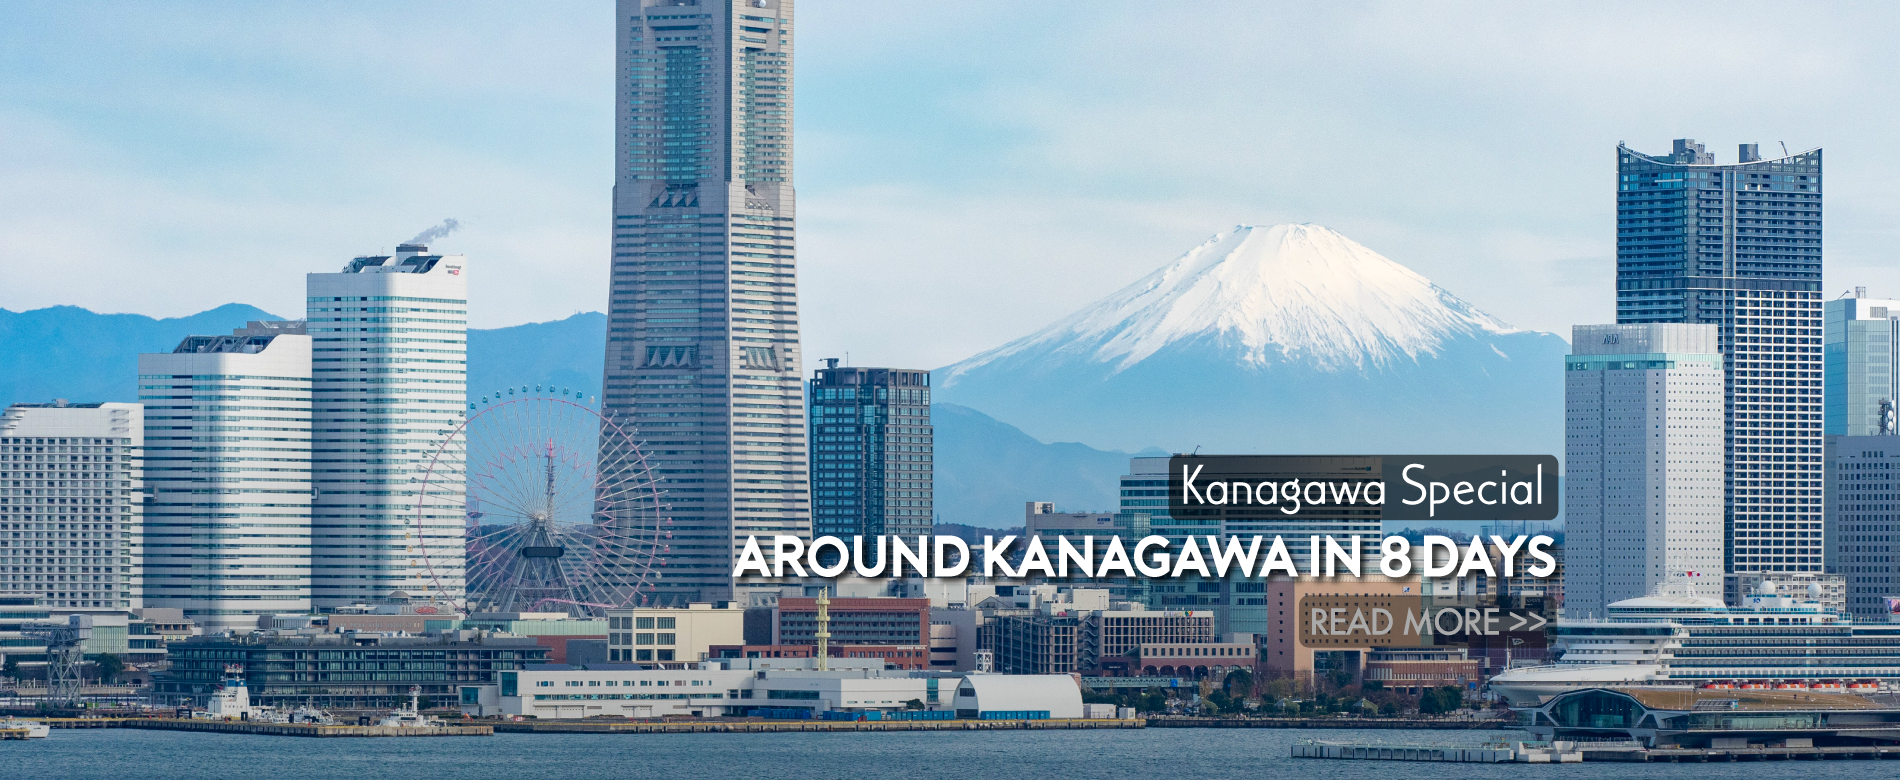 Kanagawa Article